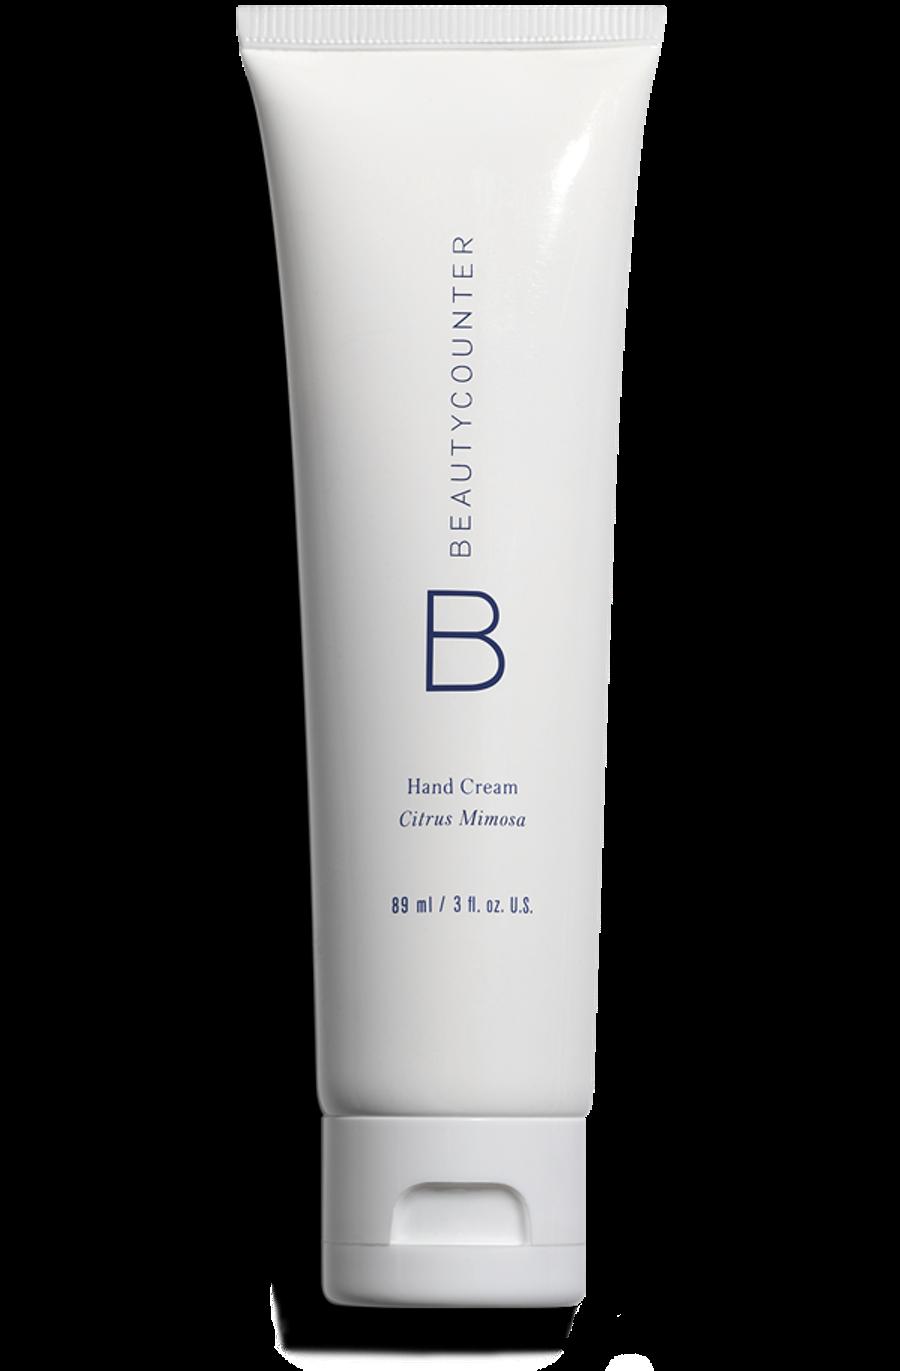 Beautycounter Hand Cream In Mimosa | Kind Gift Guide akindjourney.com